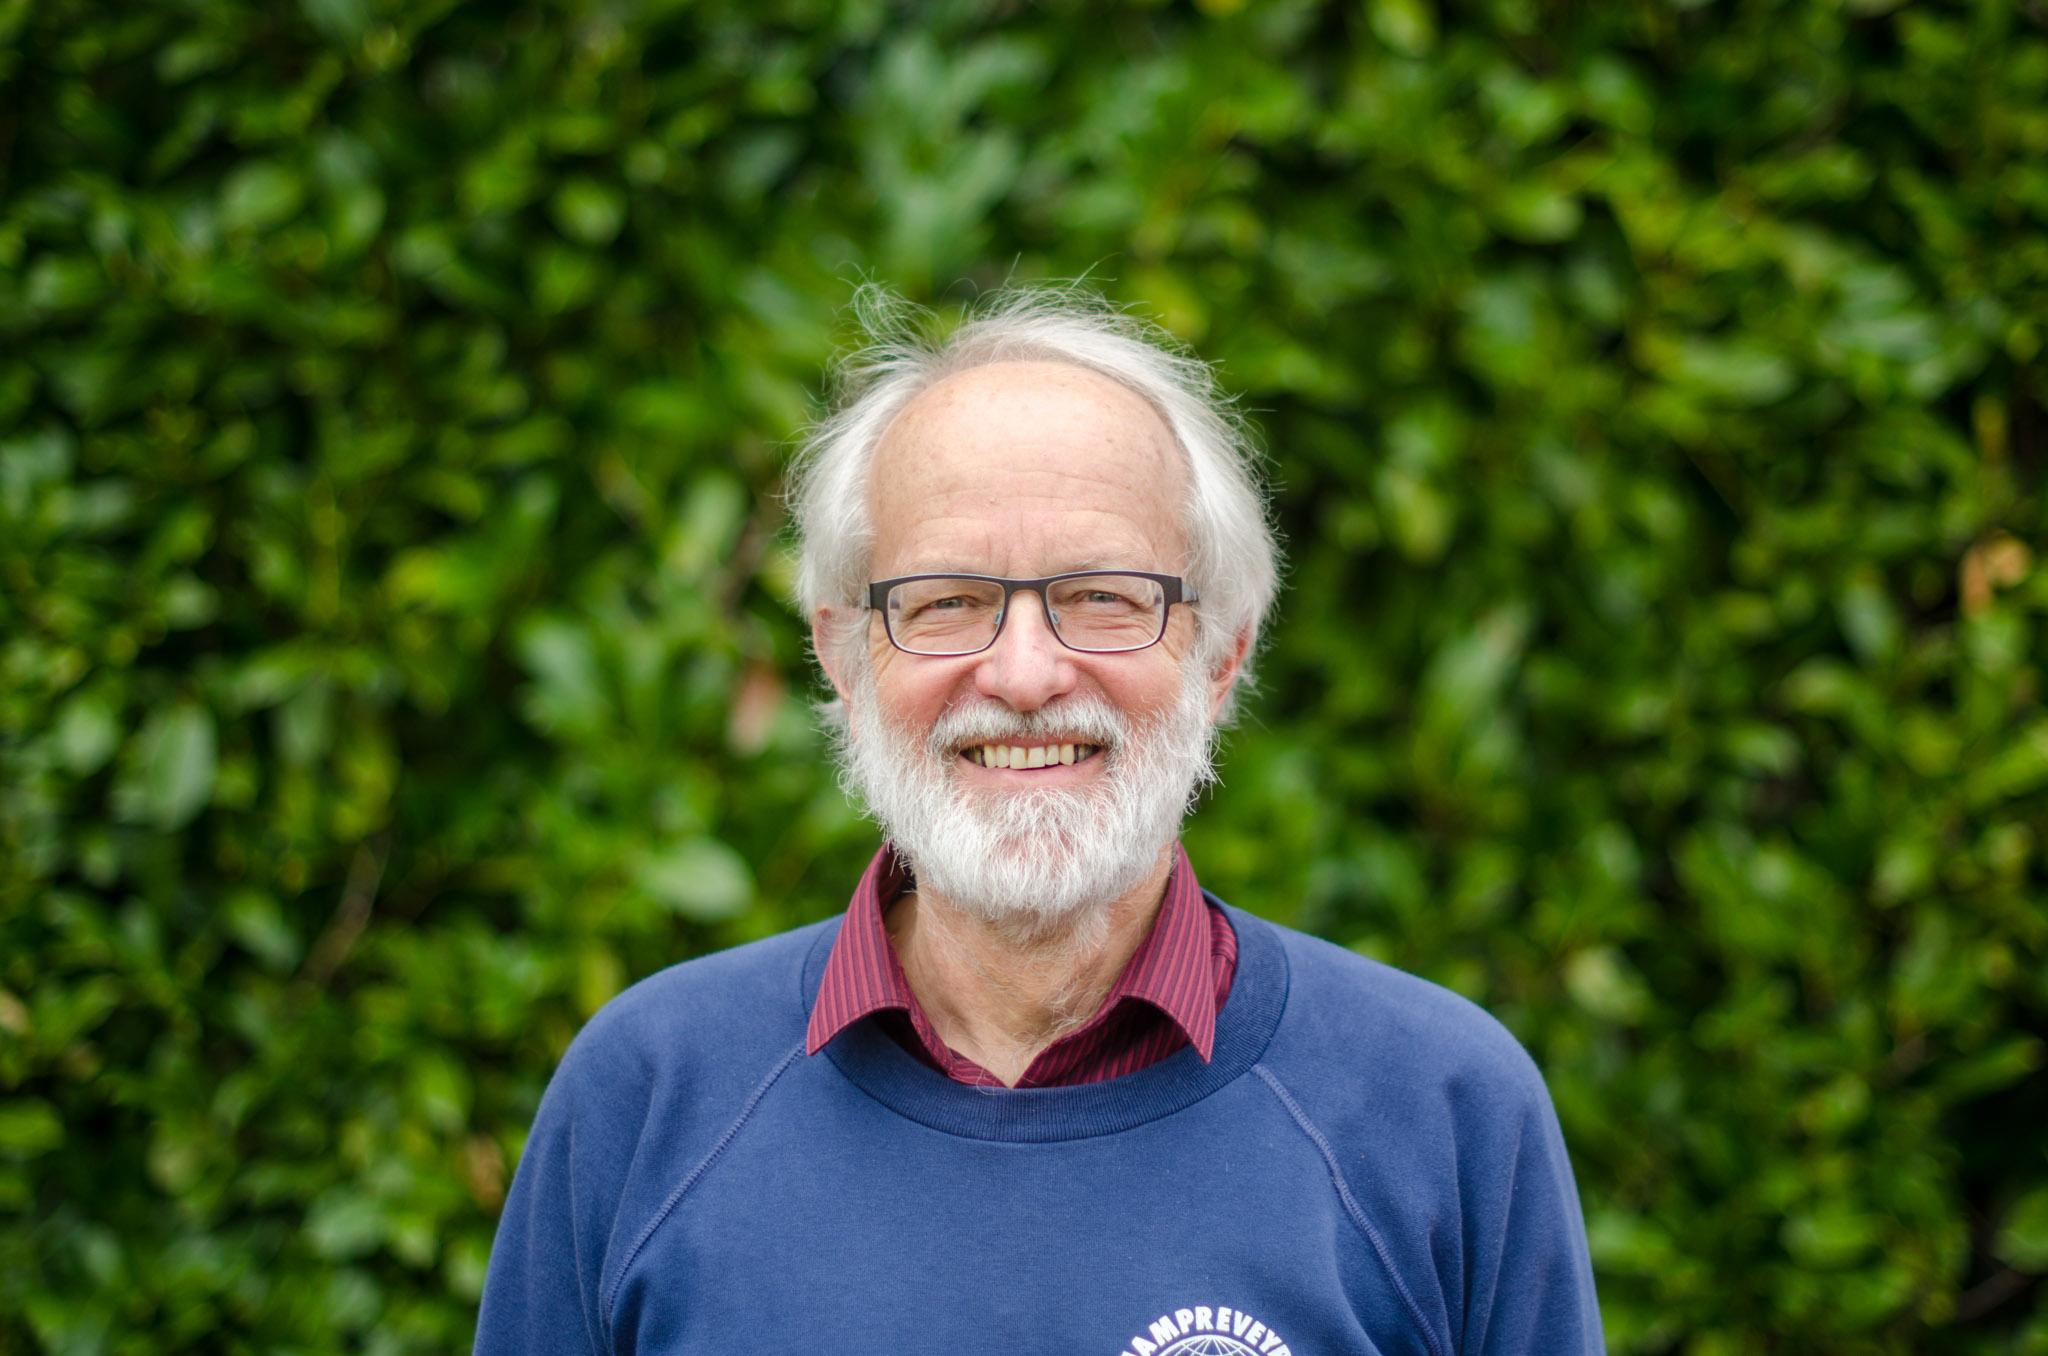 Kolumnist Heinz Gfeller. Bild: Manuel Meister